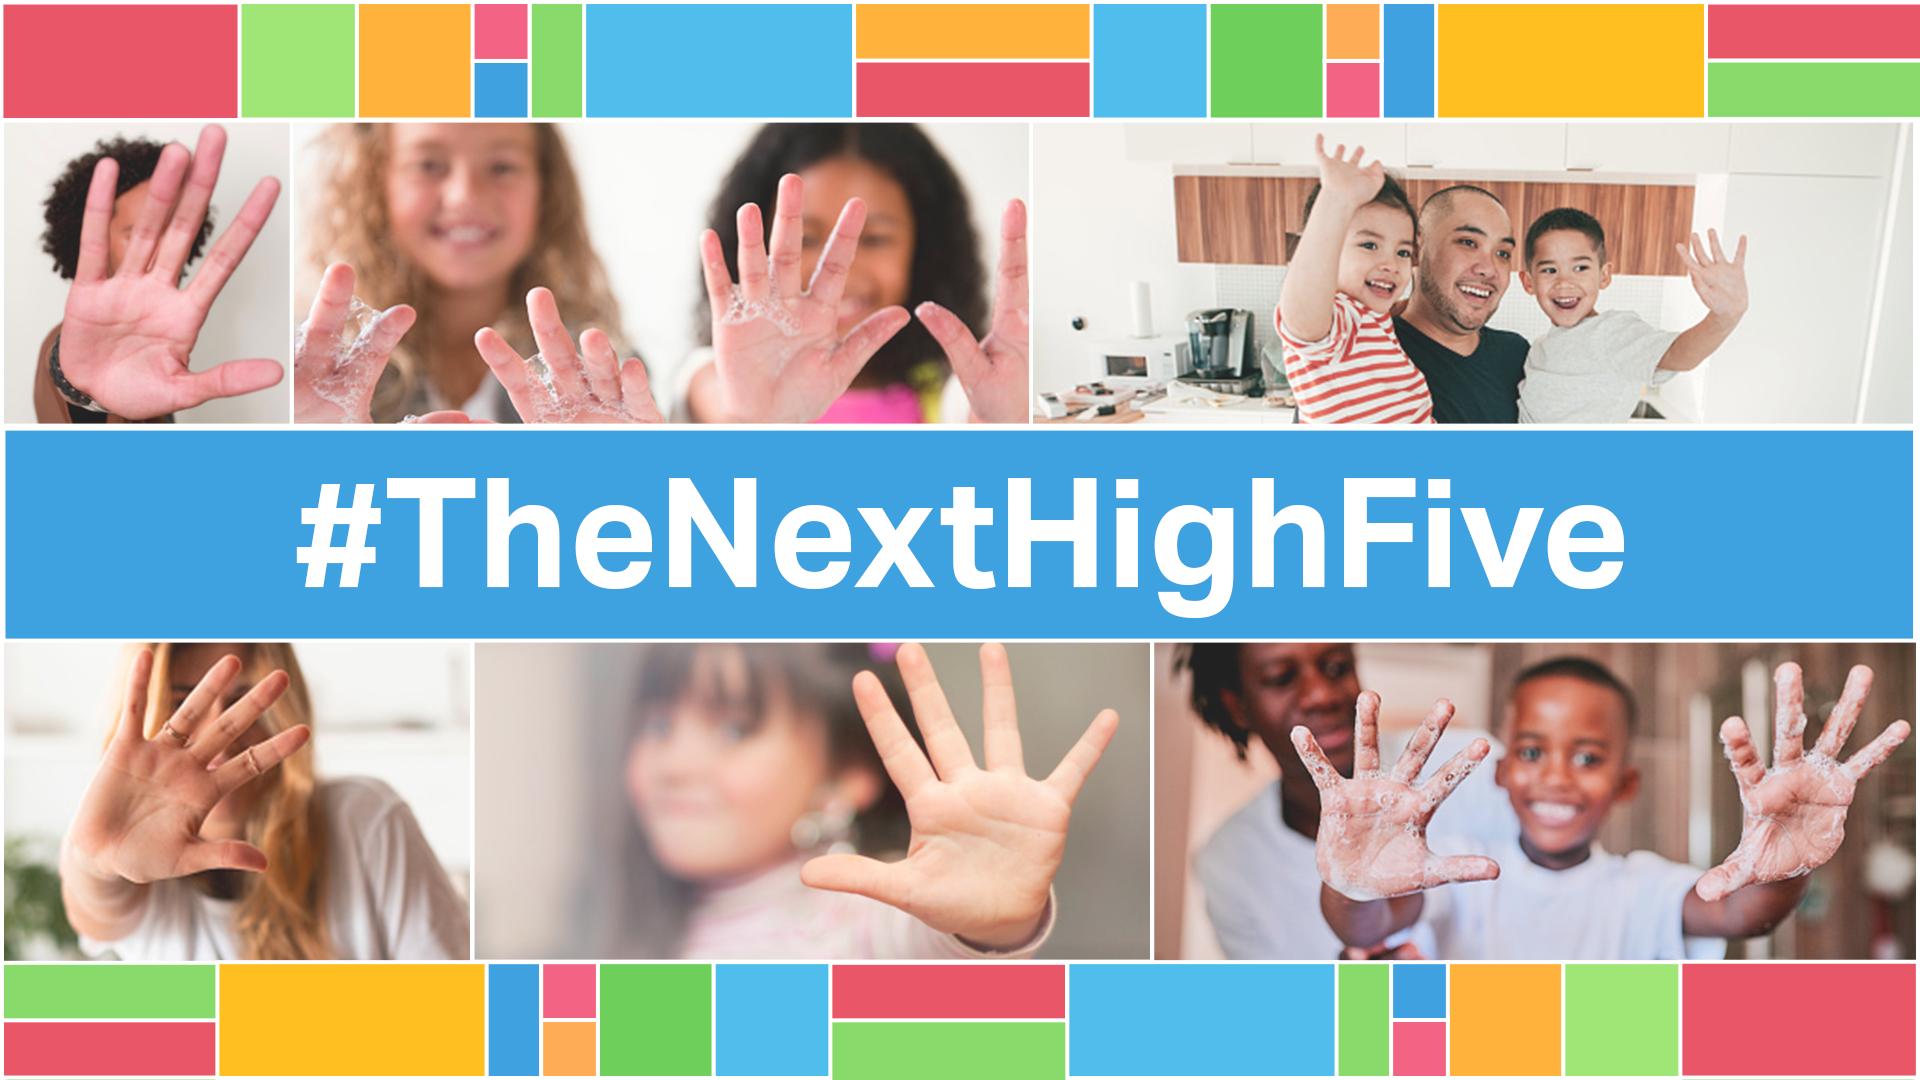 #TheNextHighFive